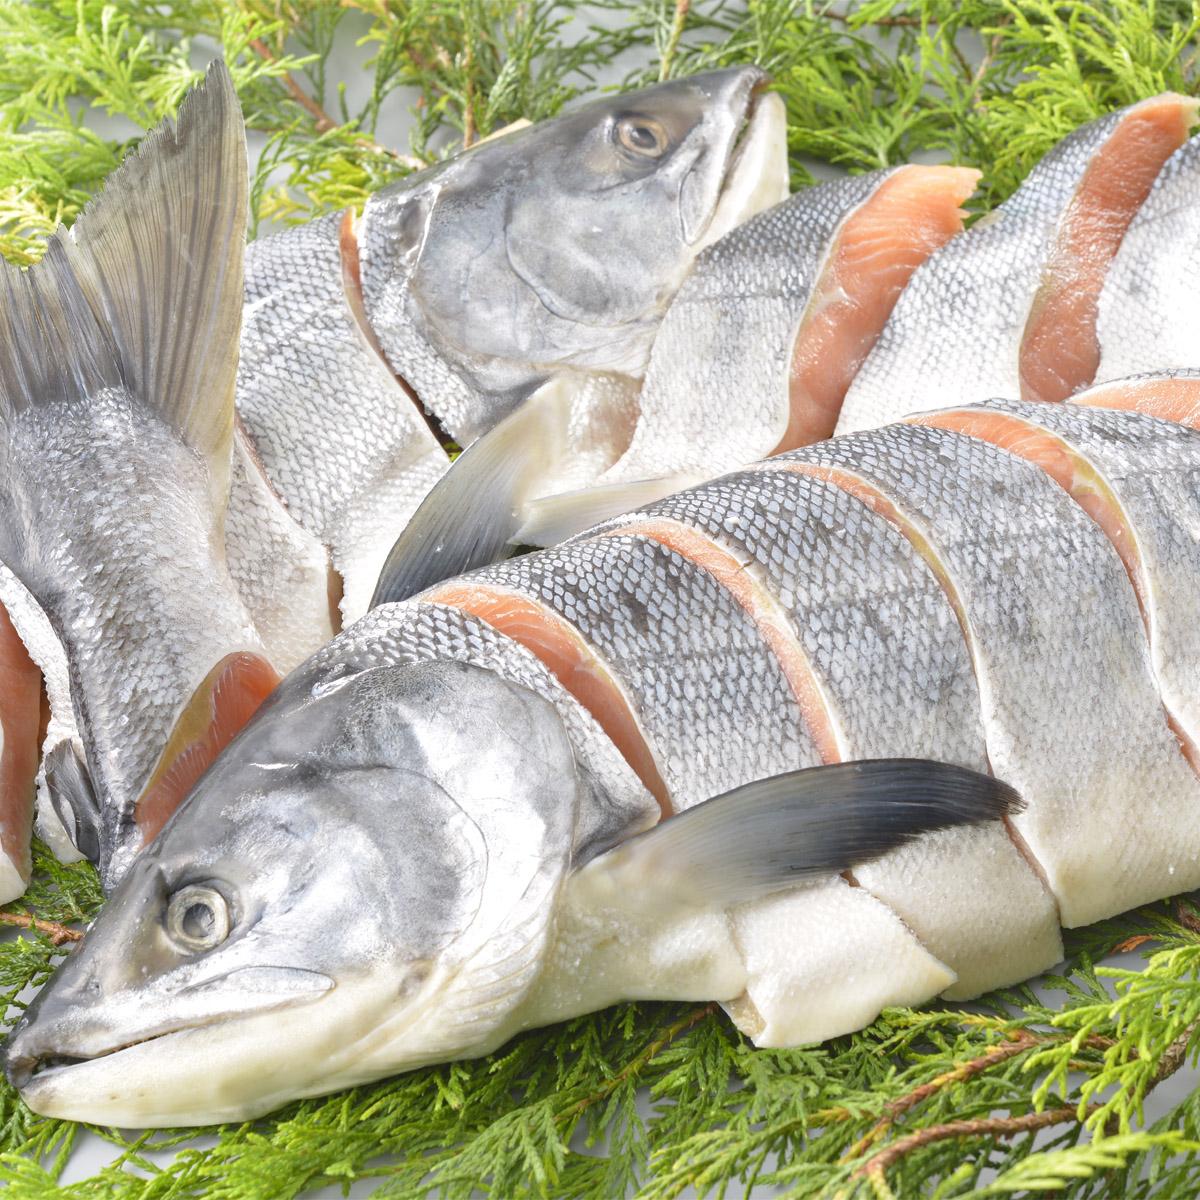 北海道白糠町 返礼品 鮭の姿切り身